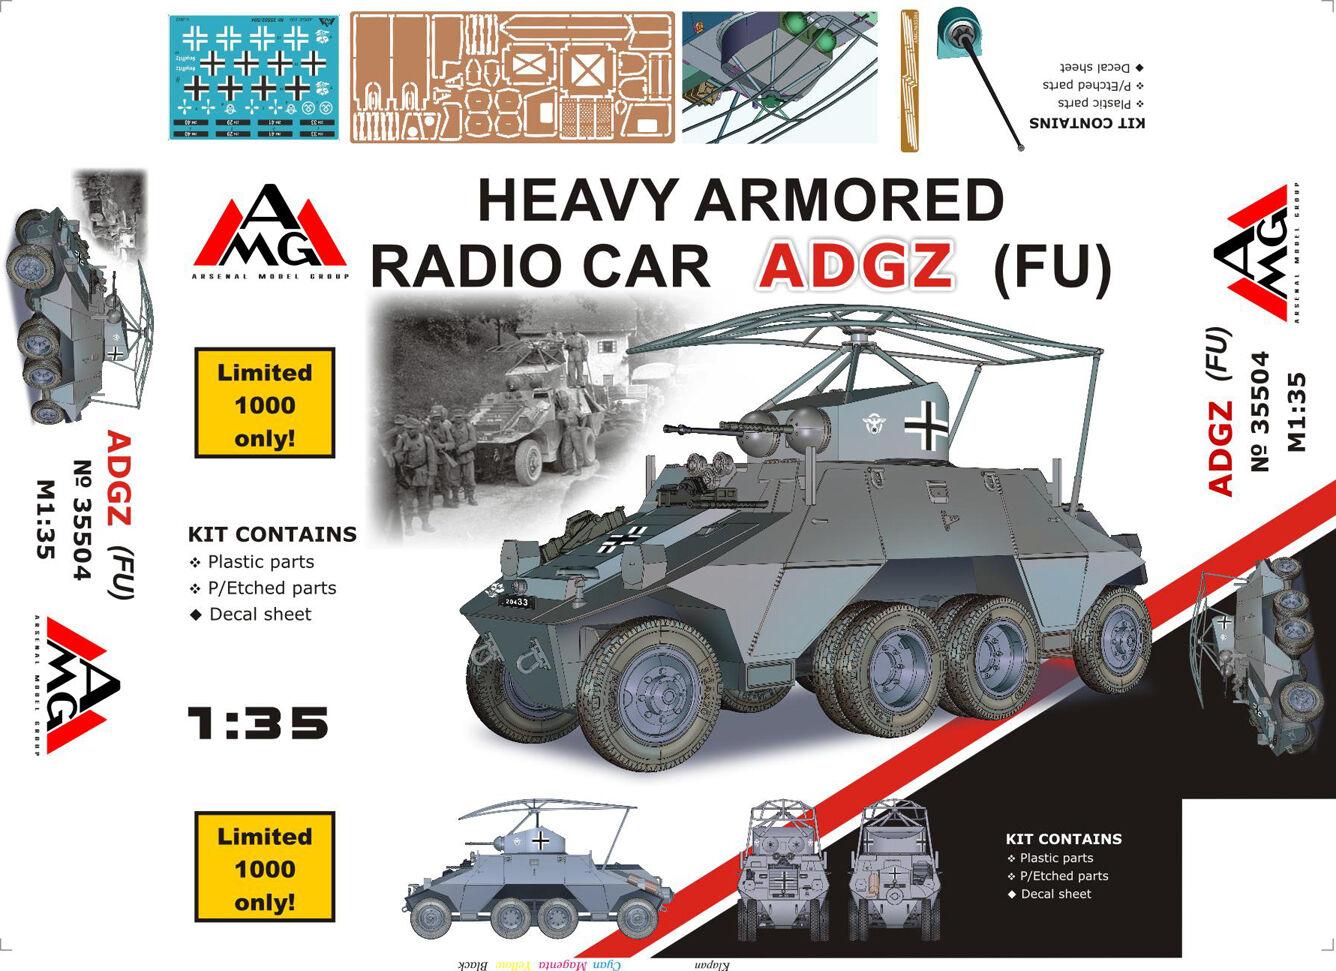 1 35 German Havy armored radio car ADGZ (FU) - NEW-RARE-AMG